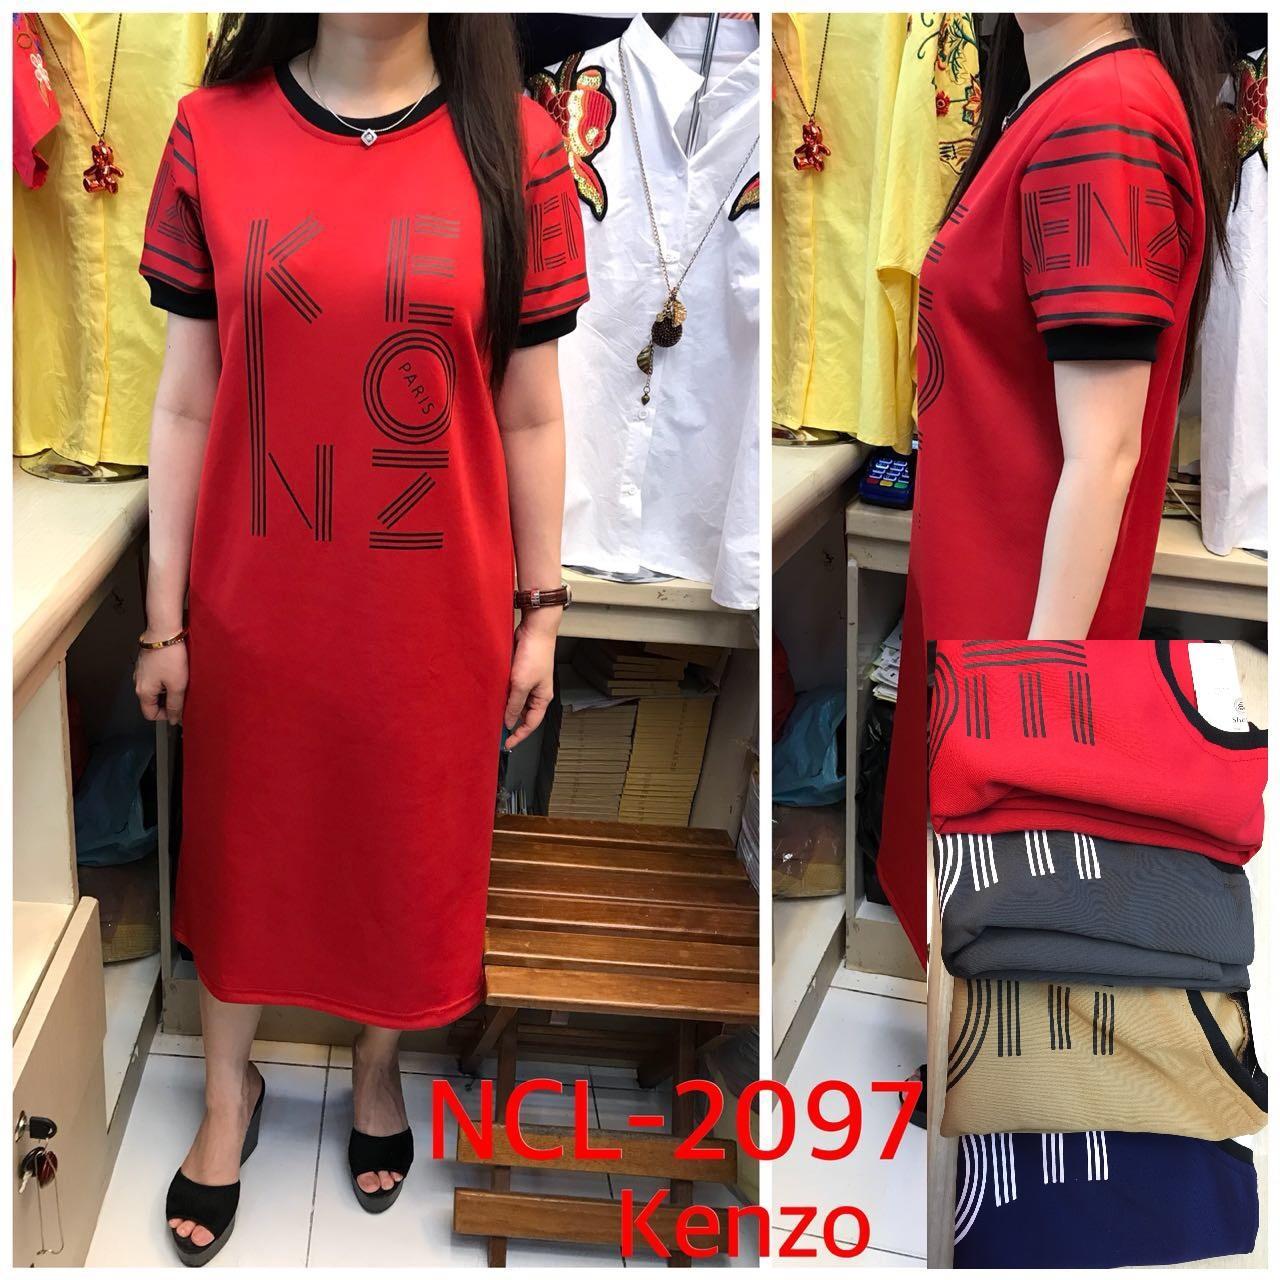 NCL 2097 Kenzo Long Dress Premium scuba import stretch tebal halus adem fit XL LD 105 baju kekinian